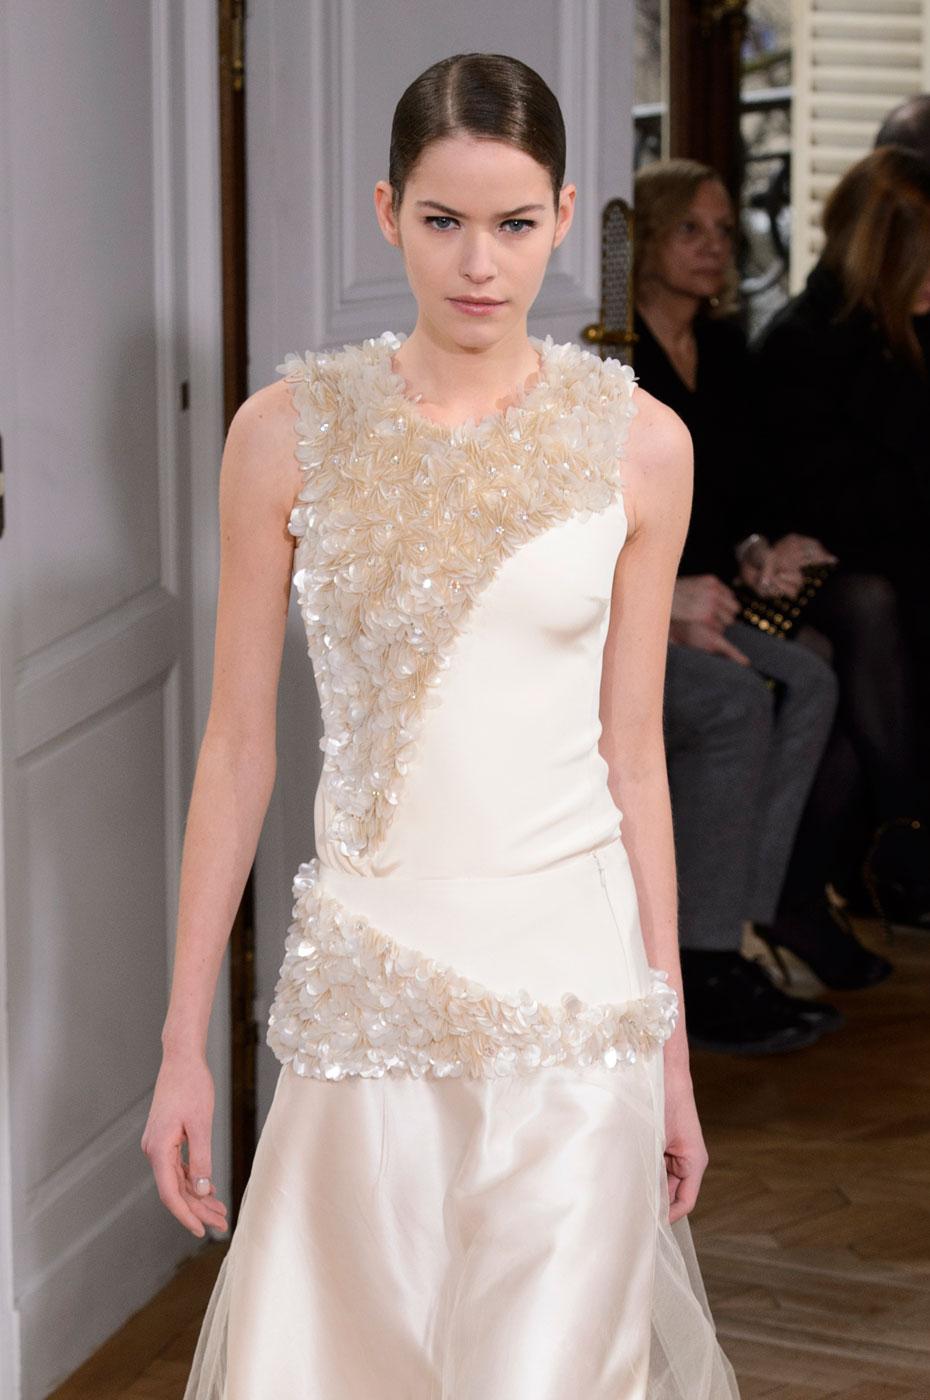 Bouchra-Jarrar-fashion-runway-show-haute-couture-paris-spring-summer-2015-the-impression-44